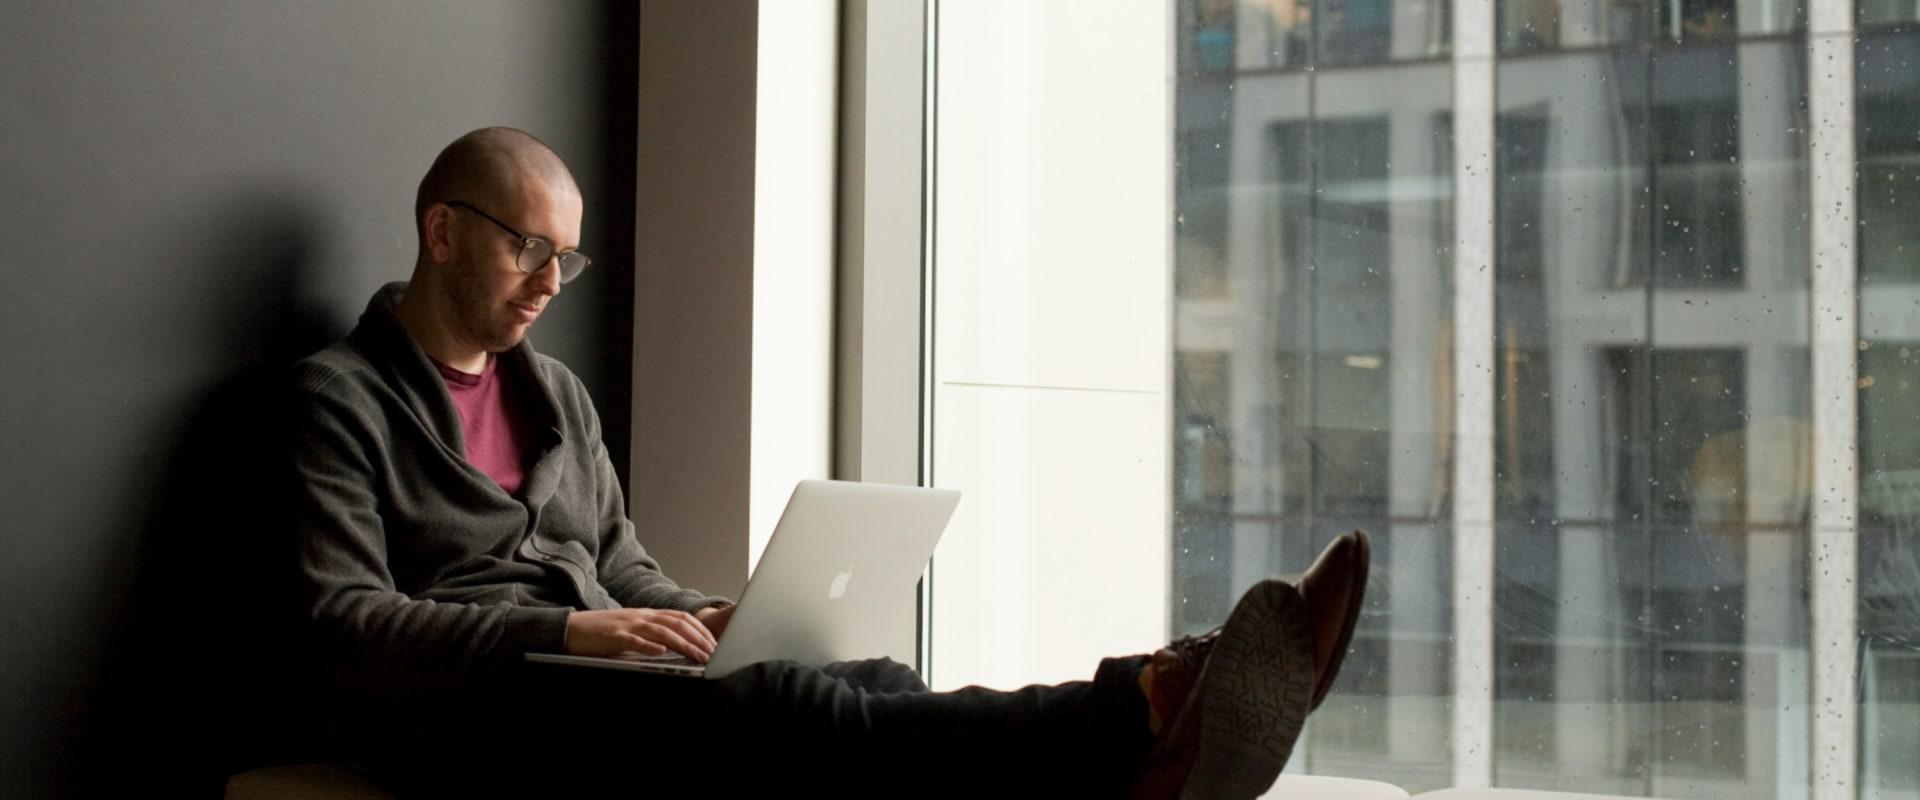 Develocraft digital product agency blog